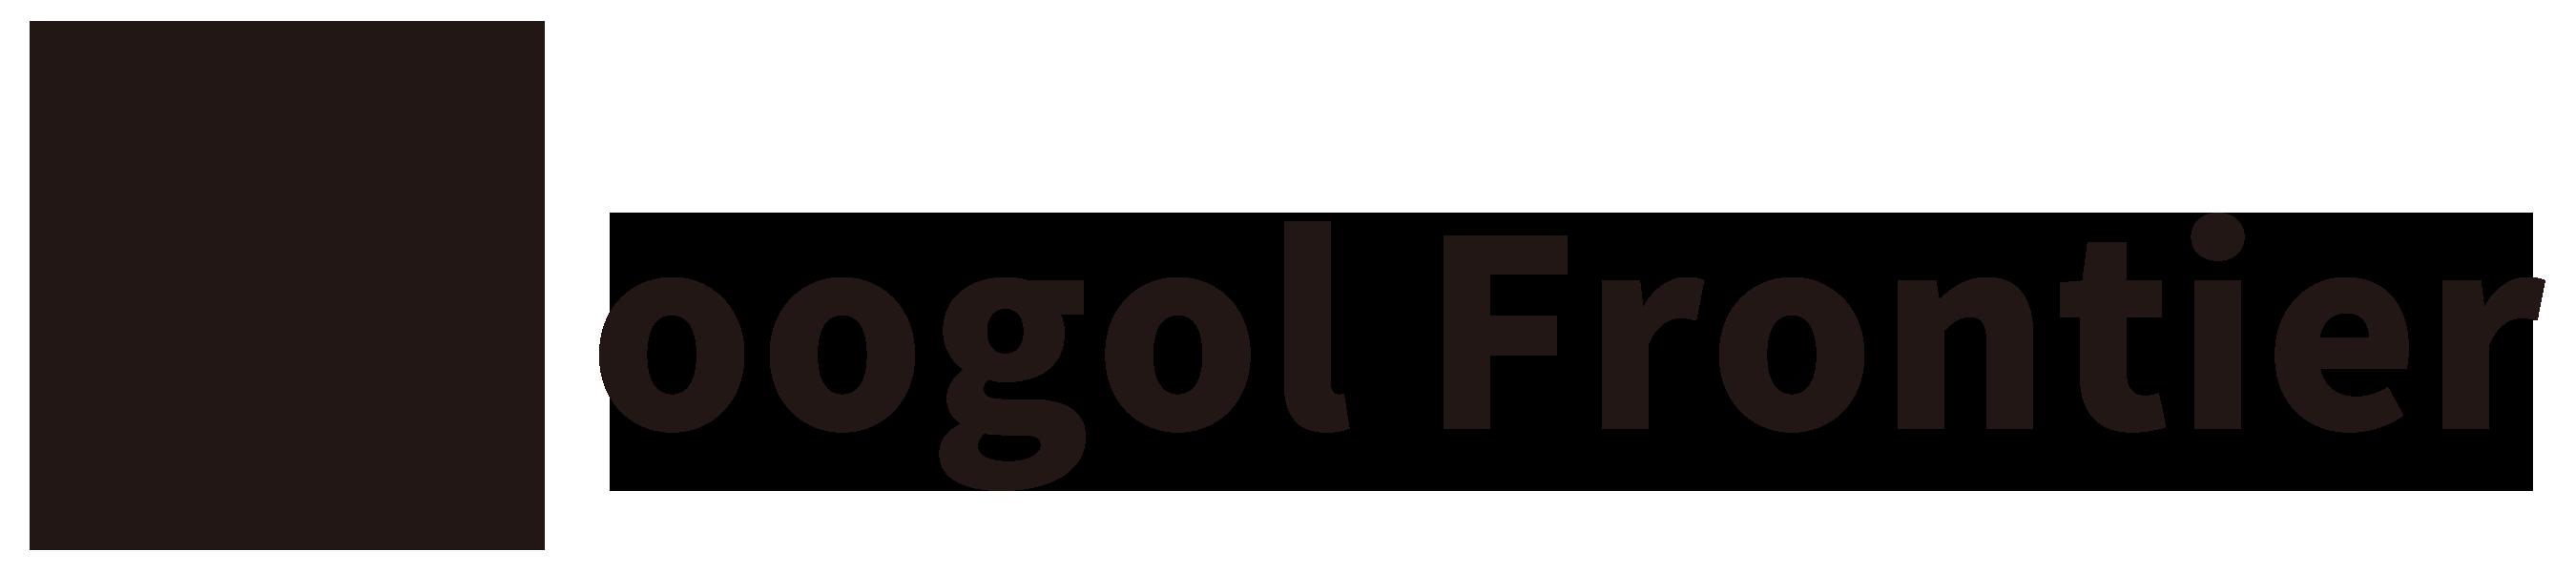 Googol Frontier